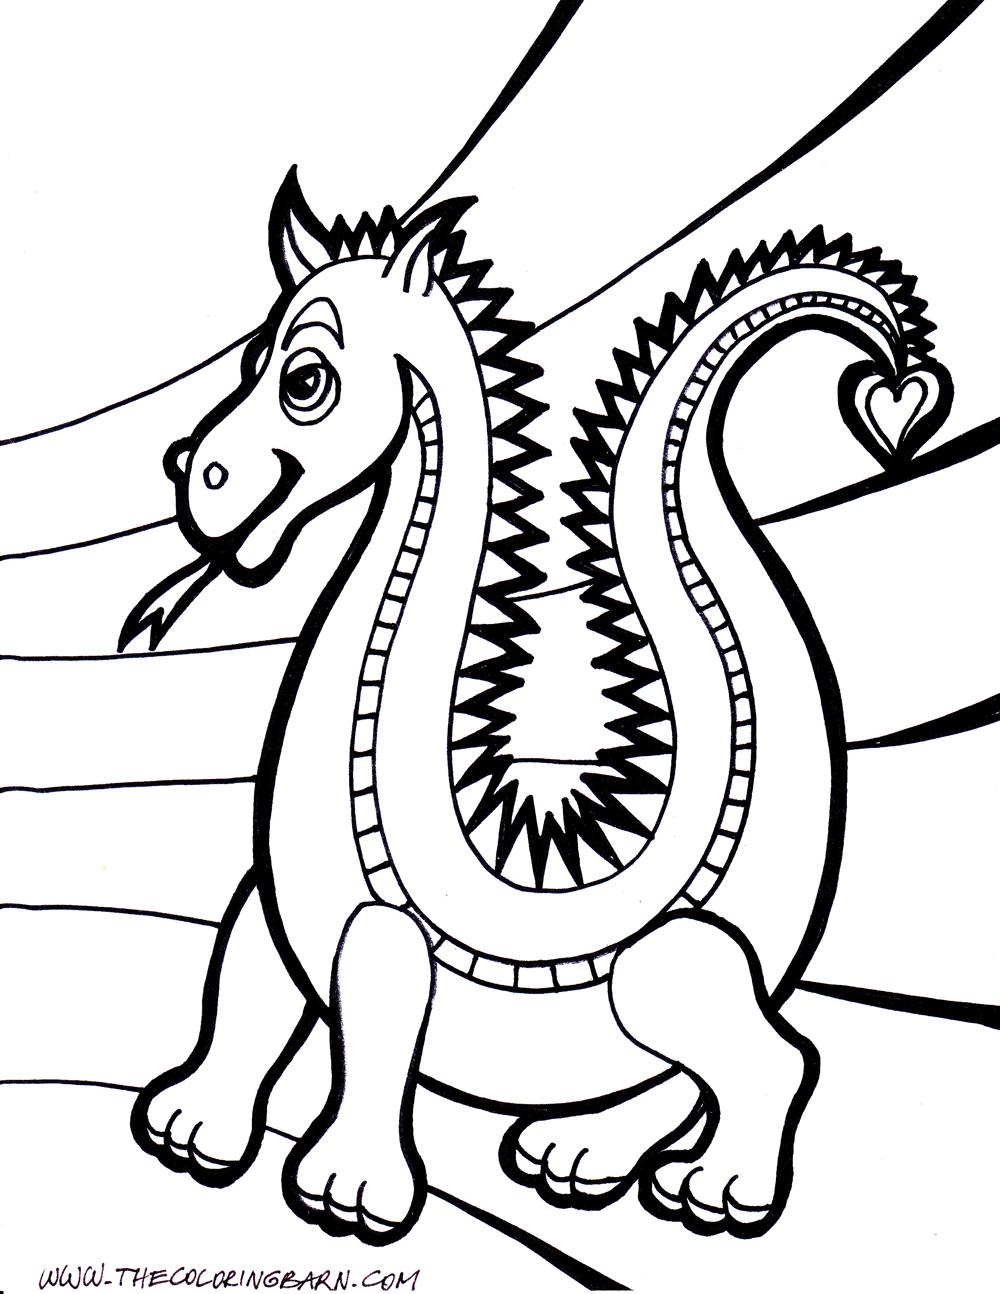 Dessin de dragon Dragon dessin  colorier